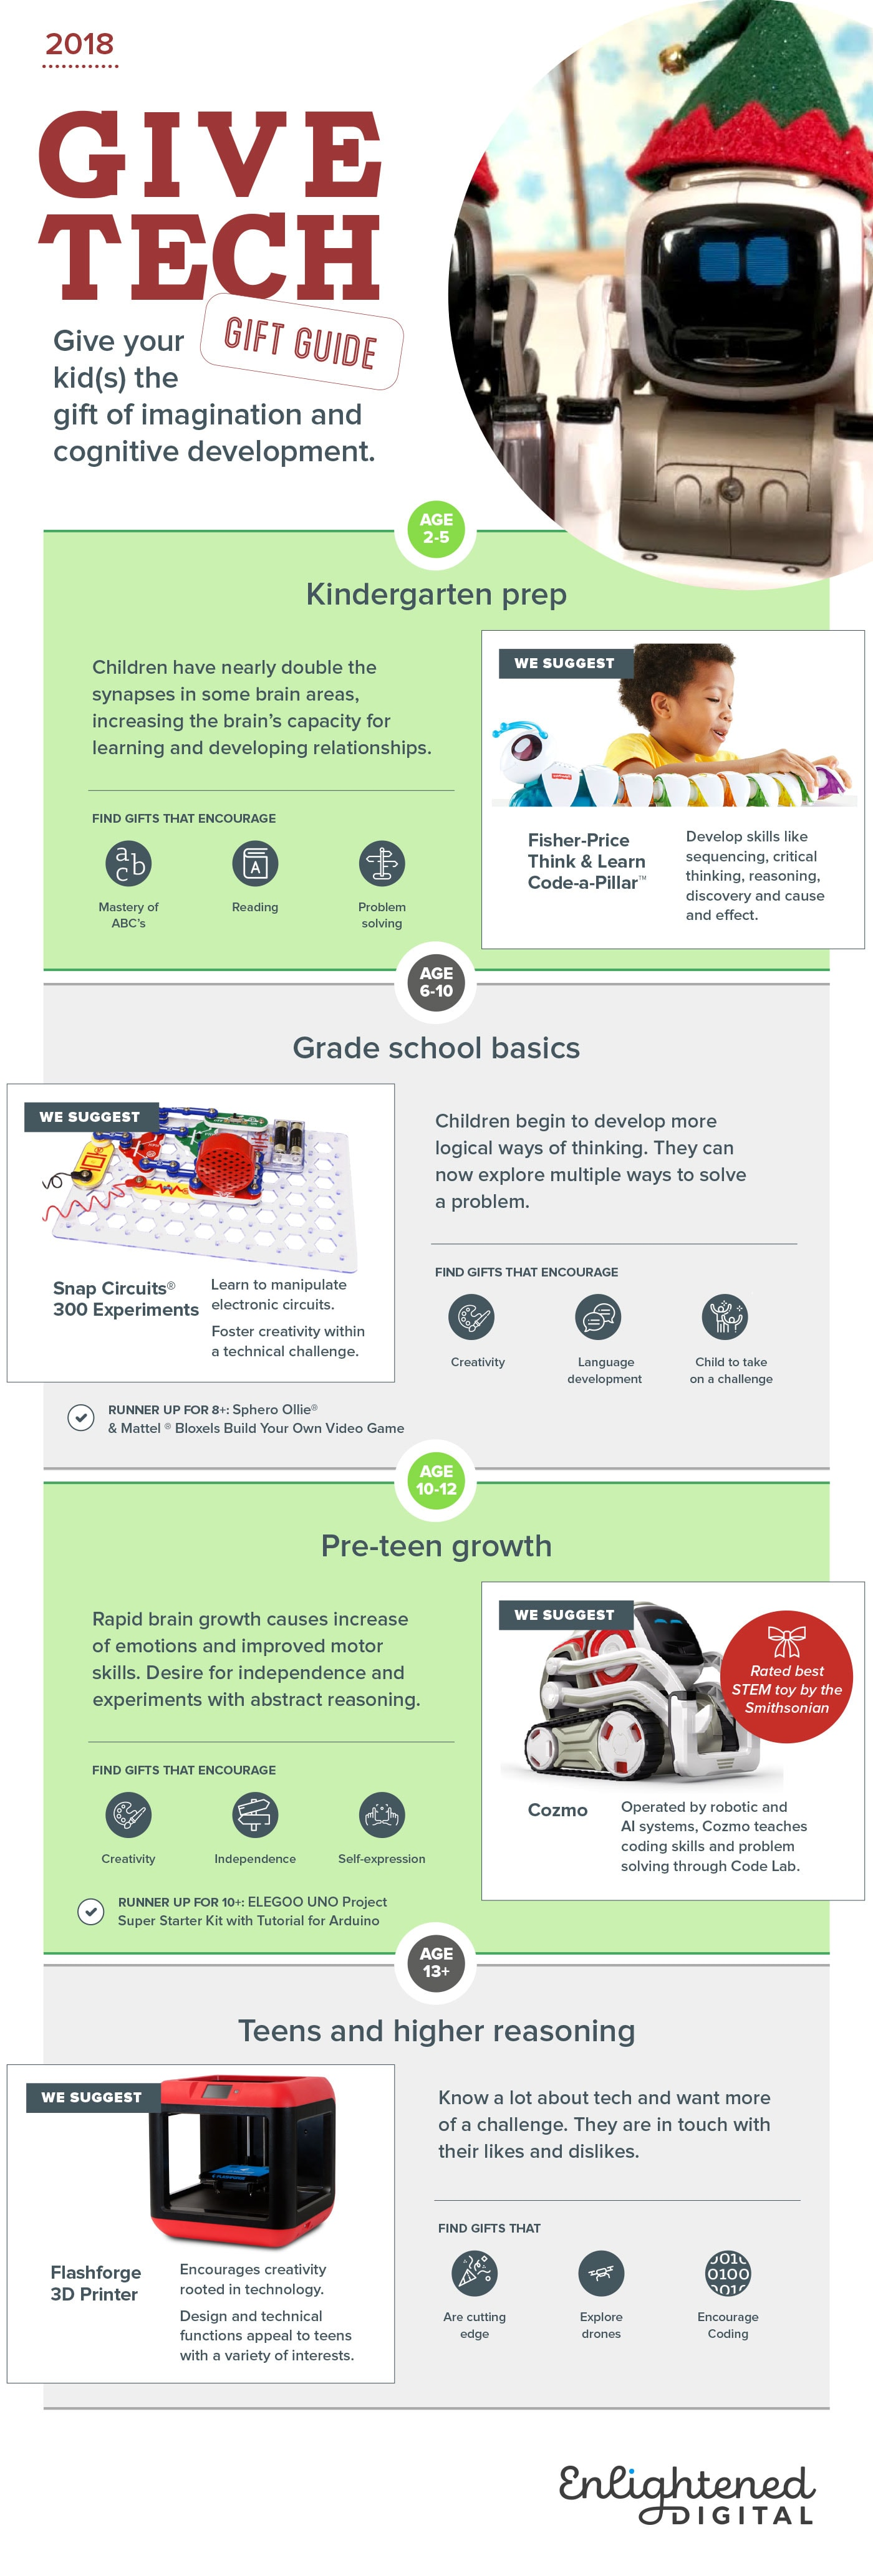 Educational gift guide from Enlightened-Digital.com